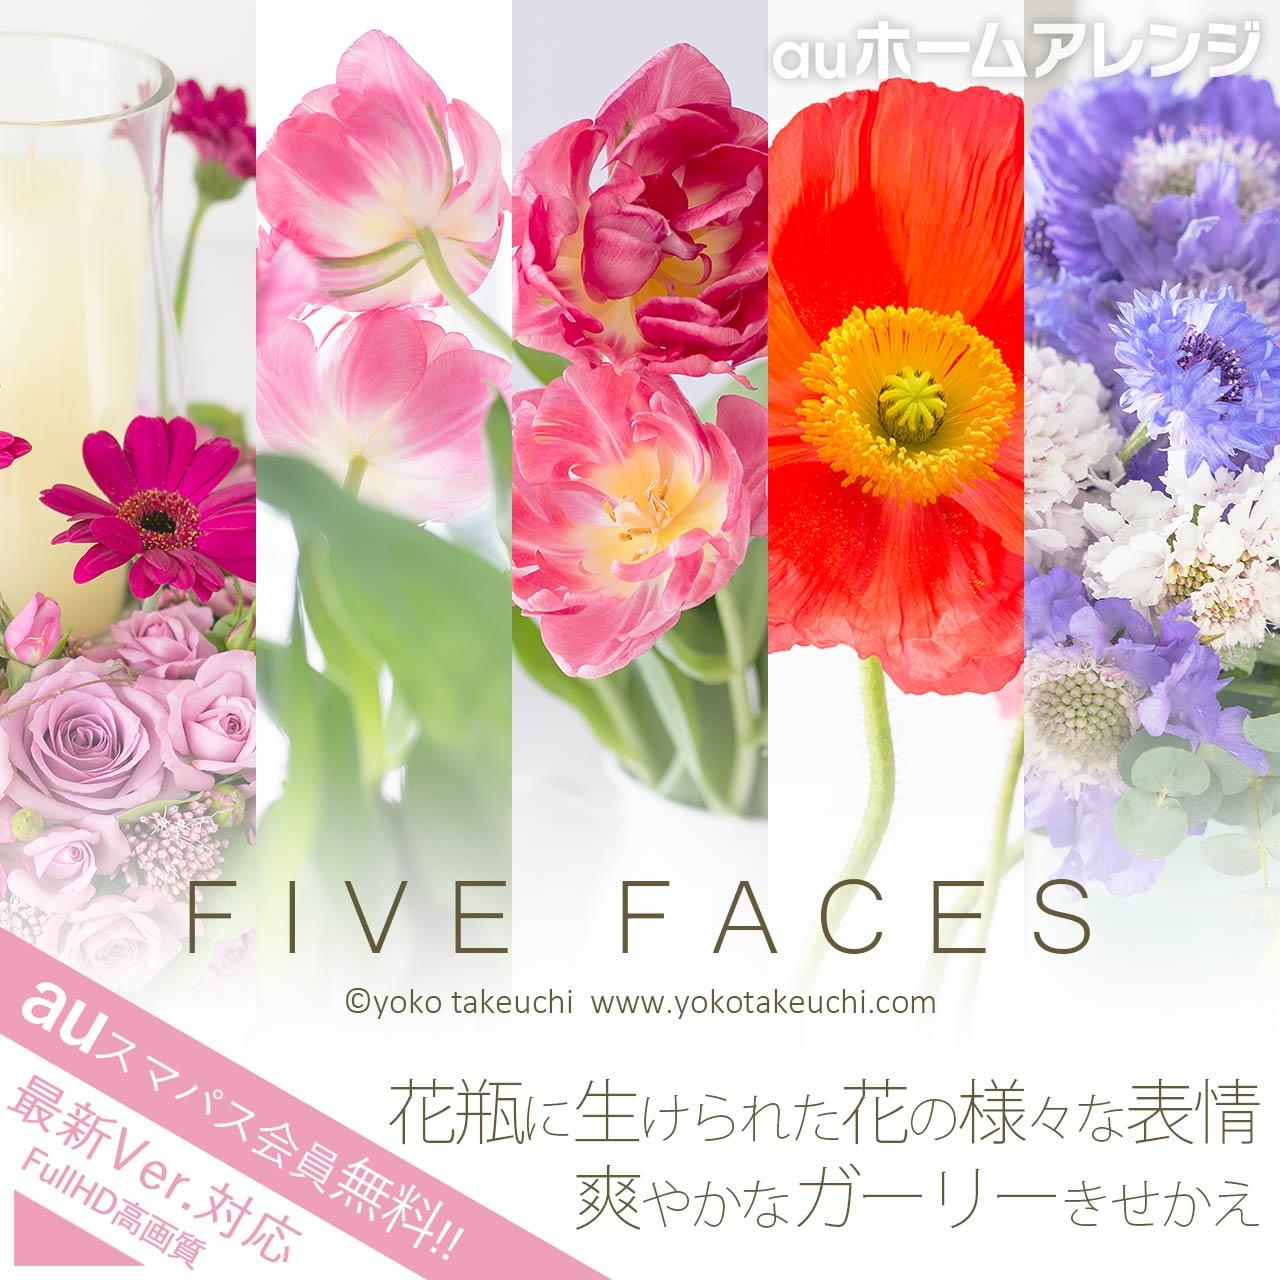 Au スマートパス 壁紙 18 竹内陽子 Yokotakeuchi フラワーアーティスト Flower Artist 写真家 フォトグラファー